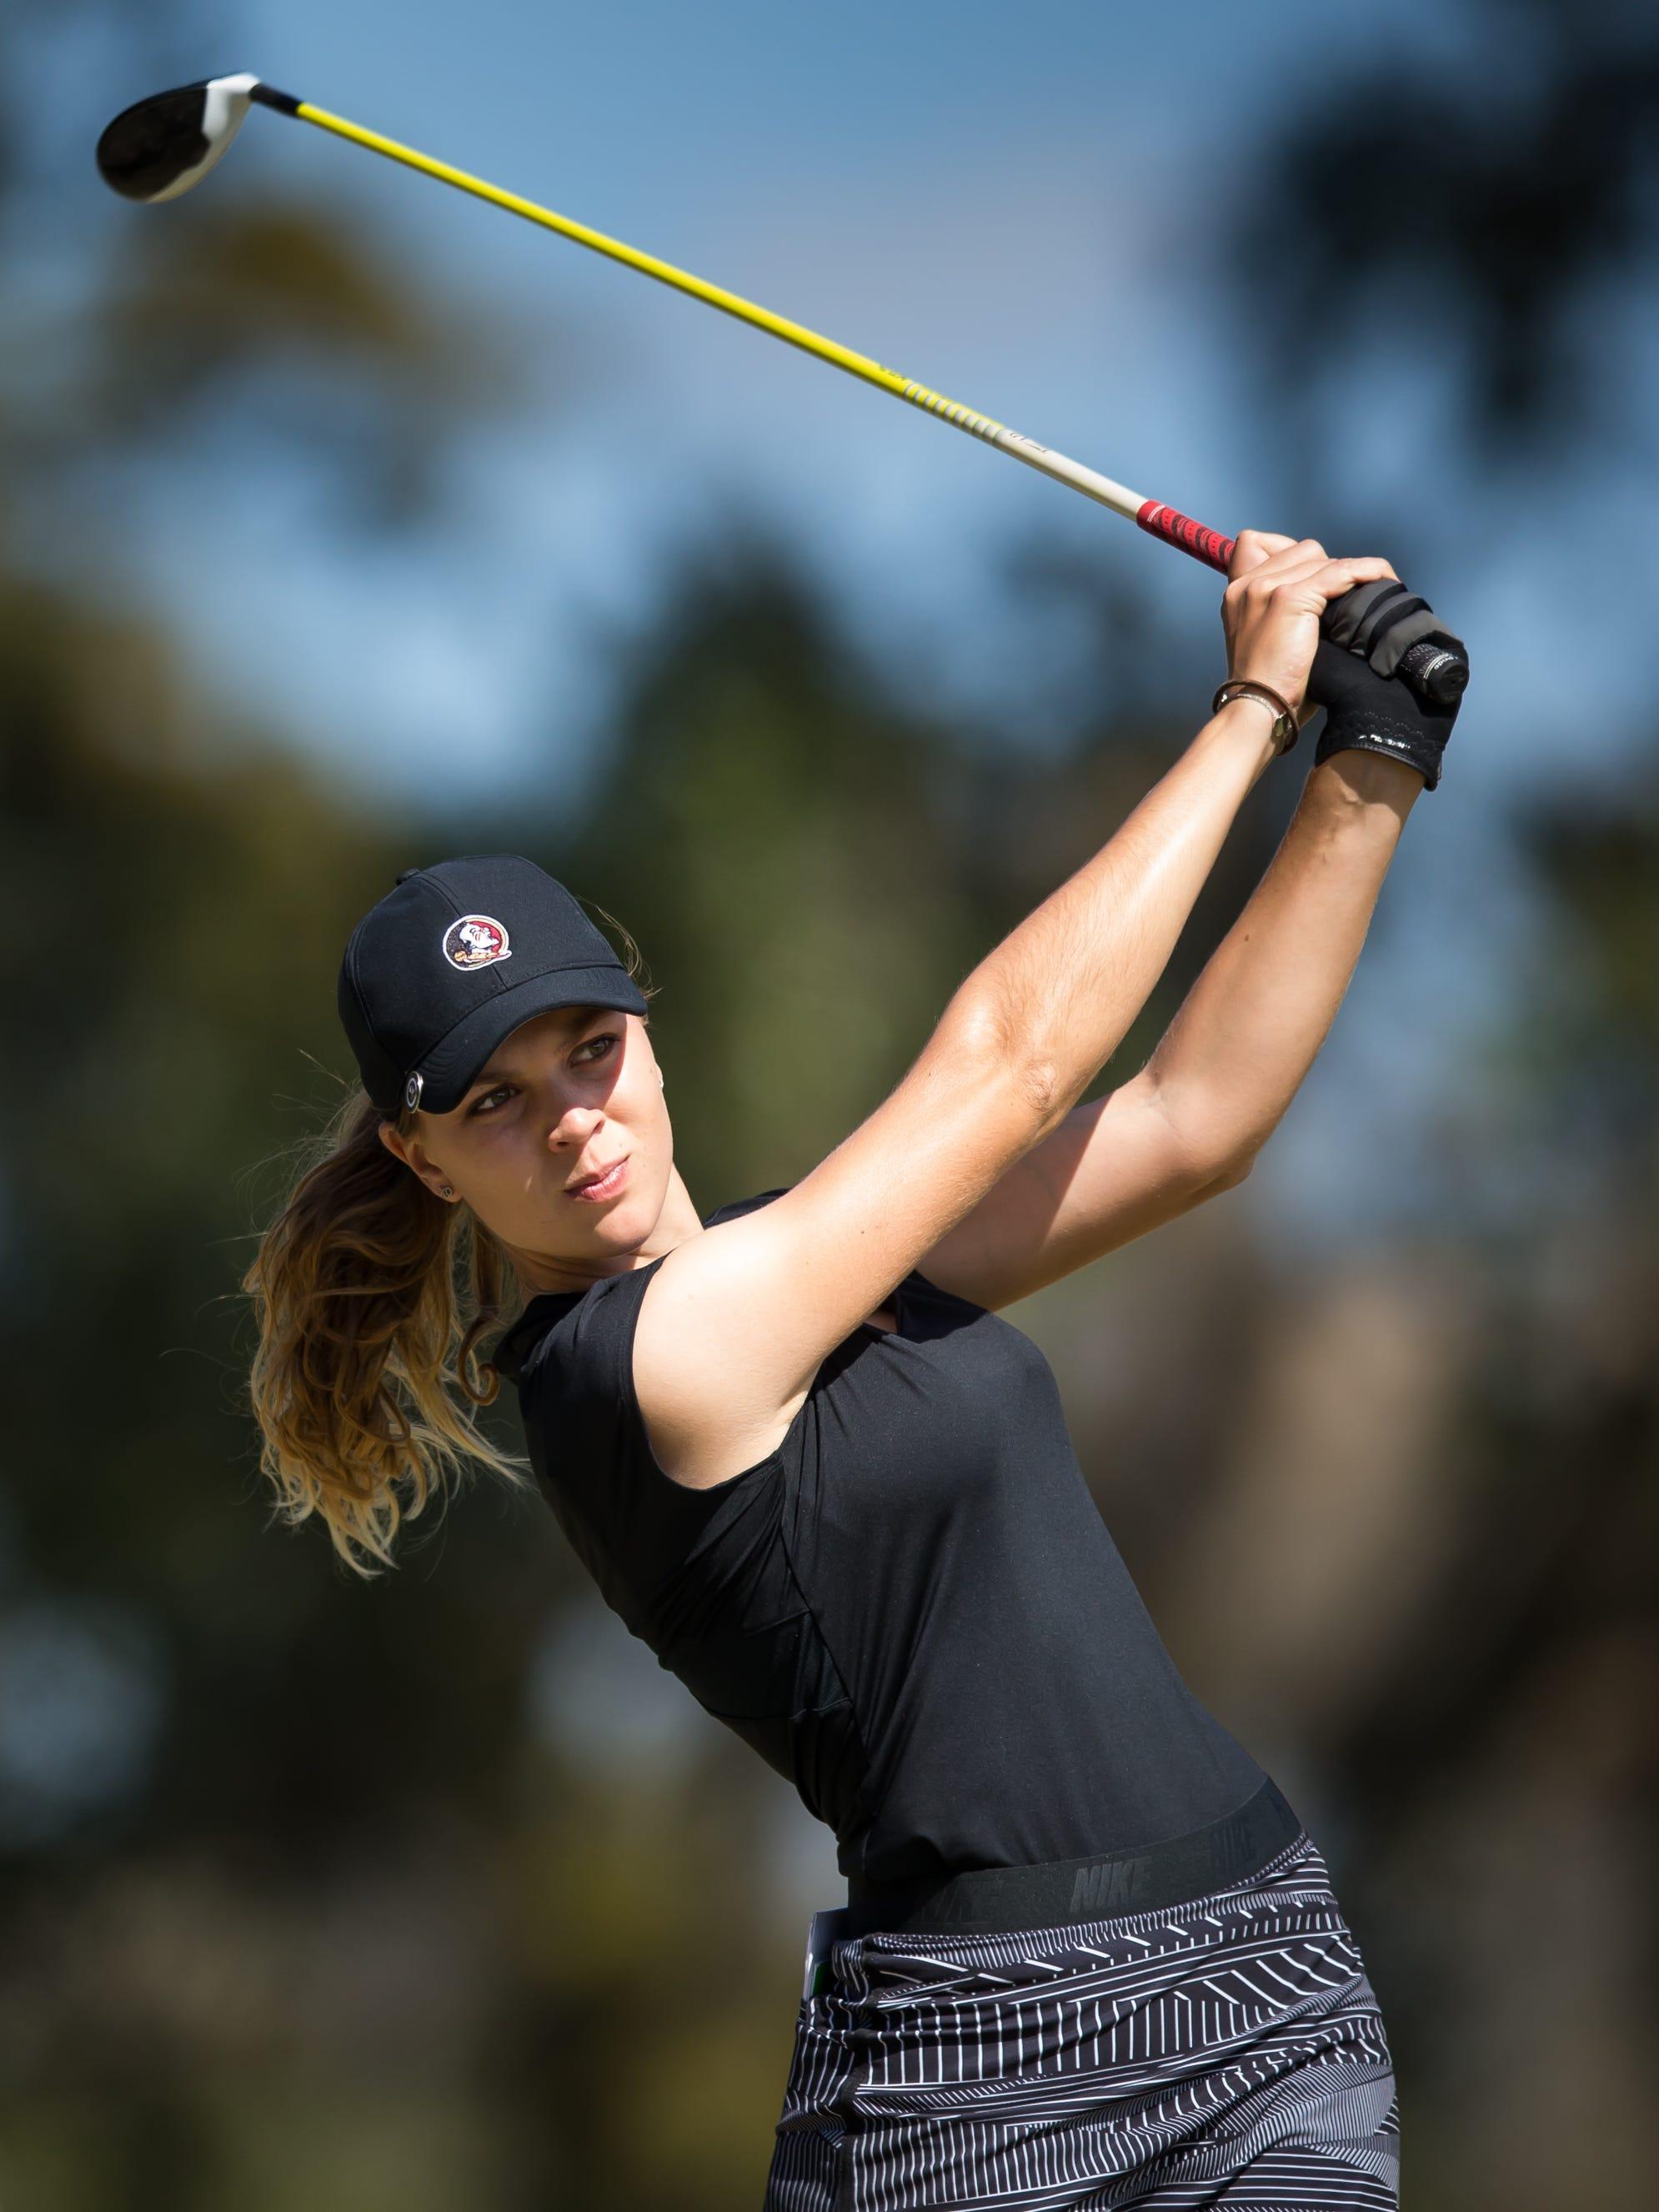 FSU's Morgane Metraux set for U.S. Women's Open